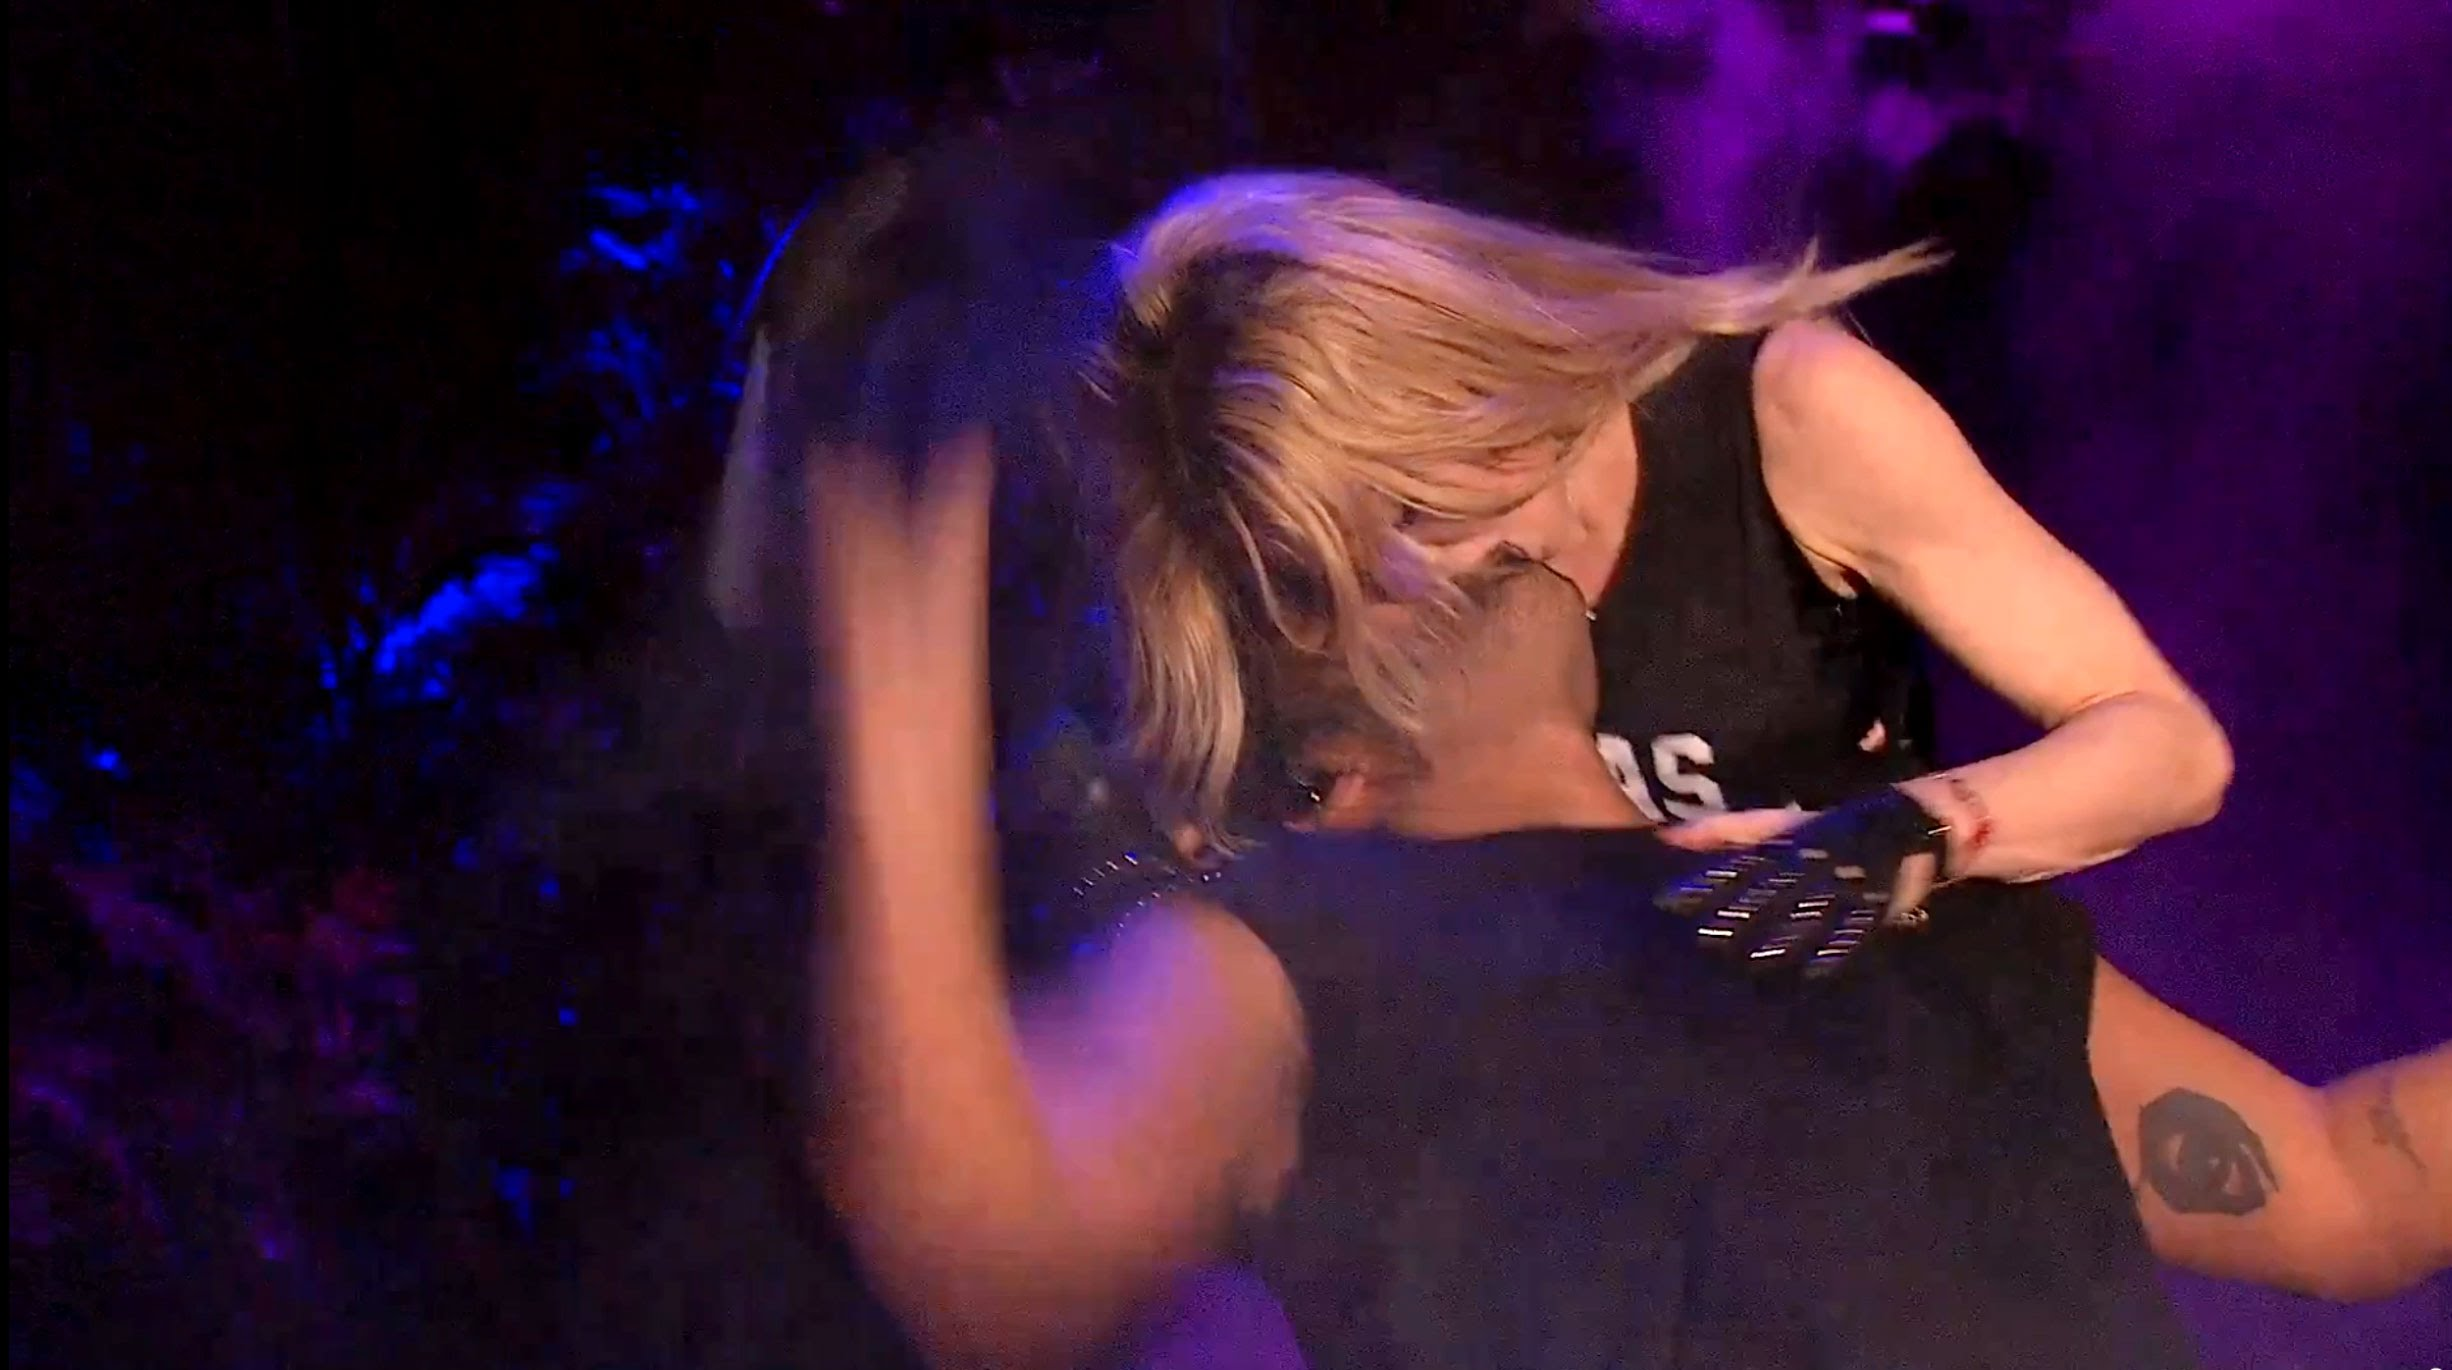 Мадона целува рапър на сцената